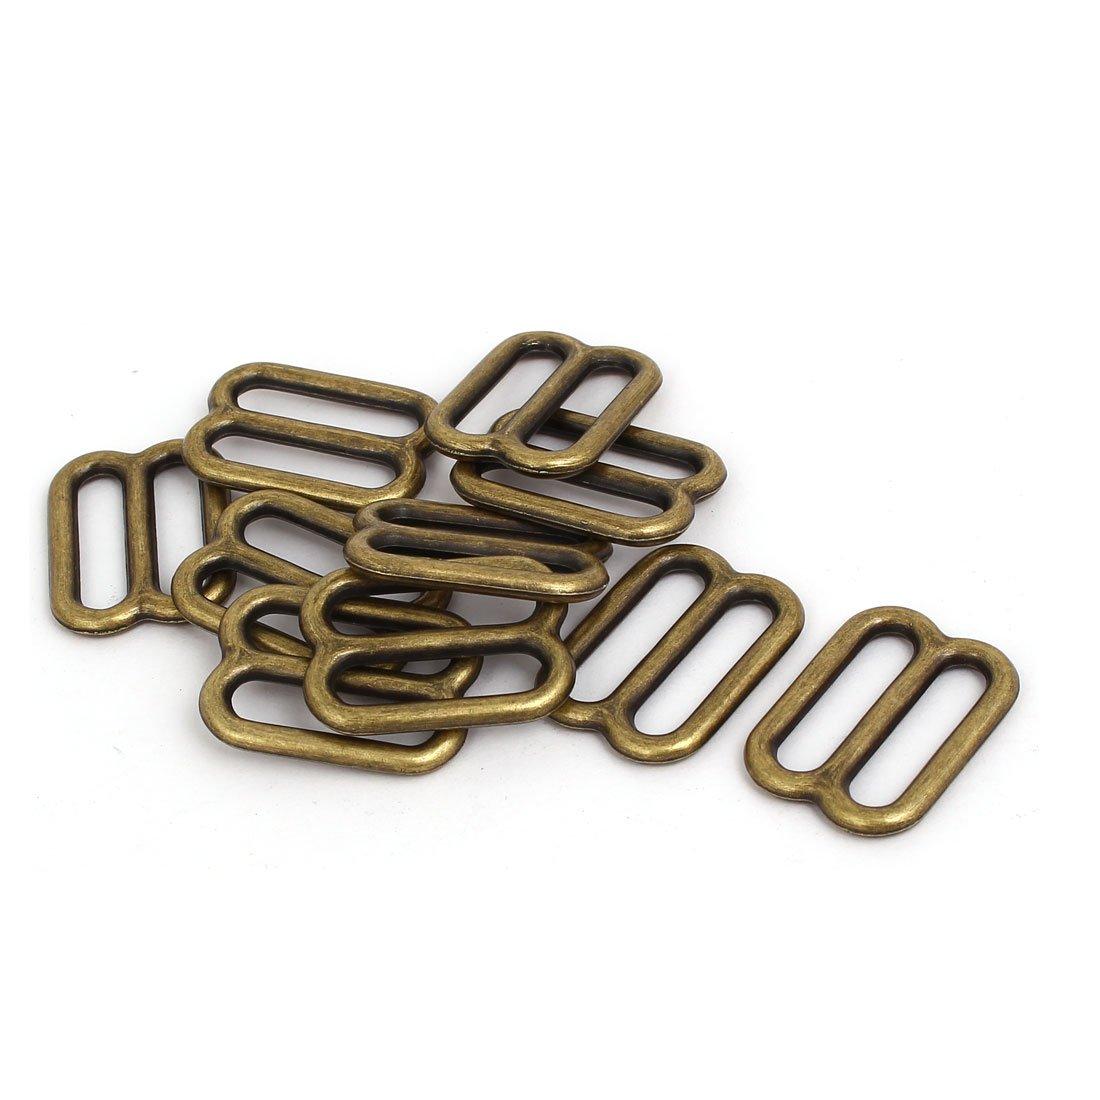 uxcell 33mmx24mmx3.5mm Adjustable Strap Slider Suitcase Bag Fitting Bronze Tone 10pcs